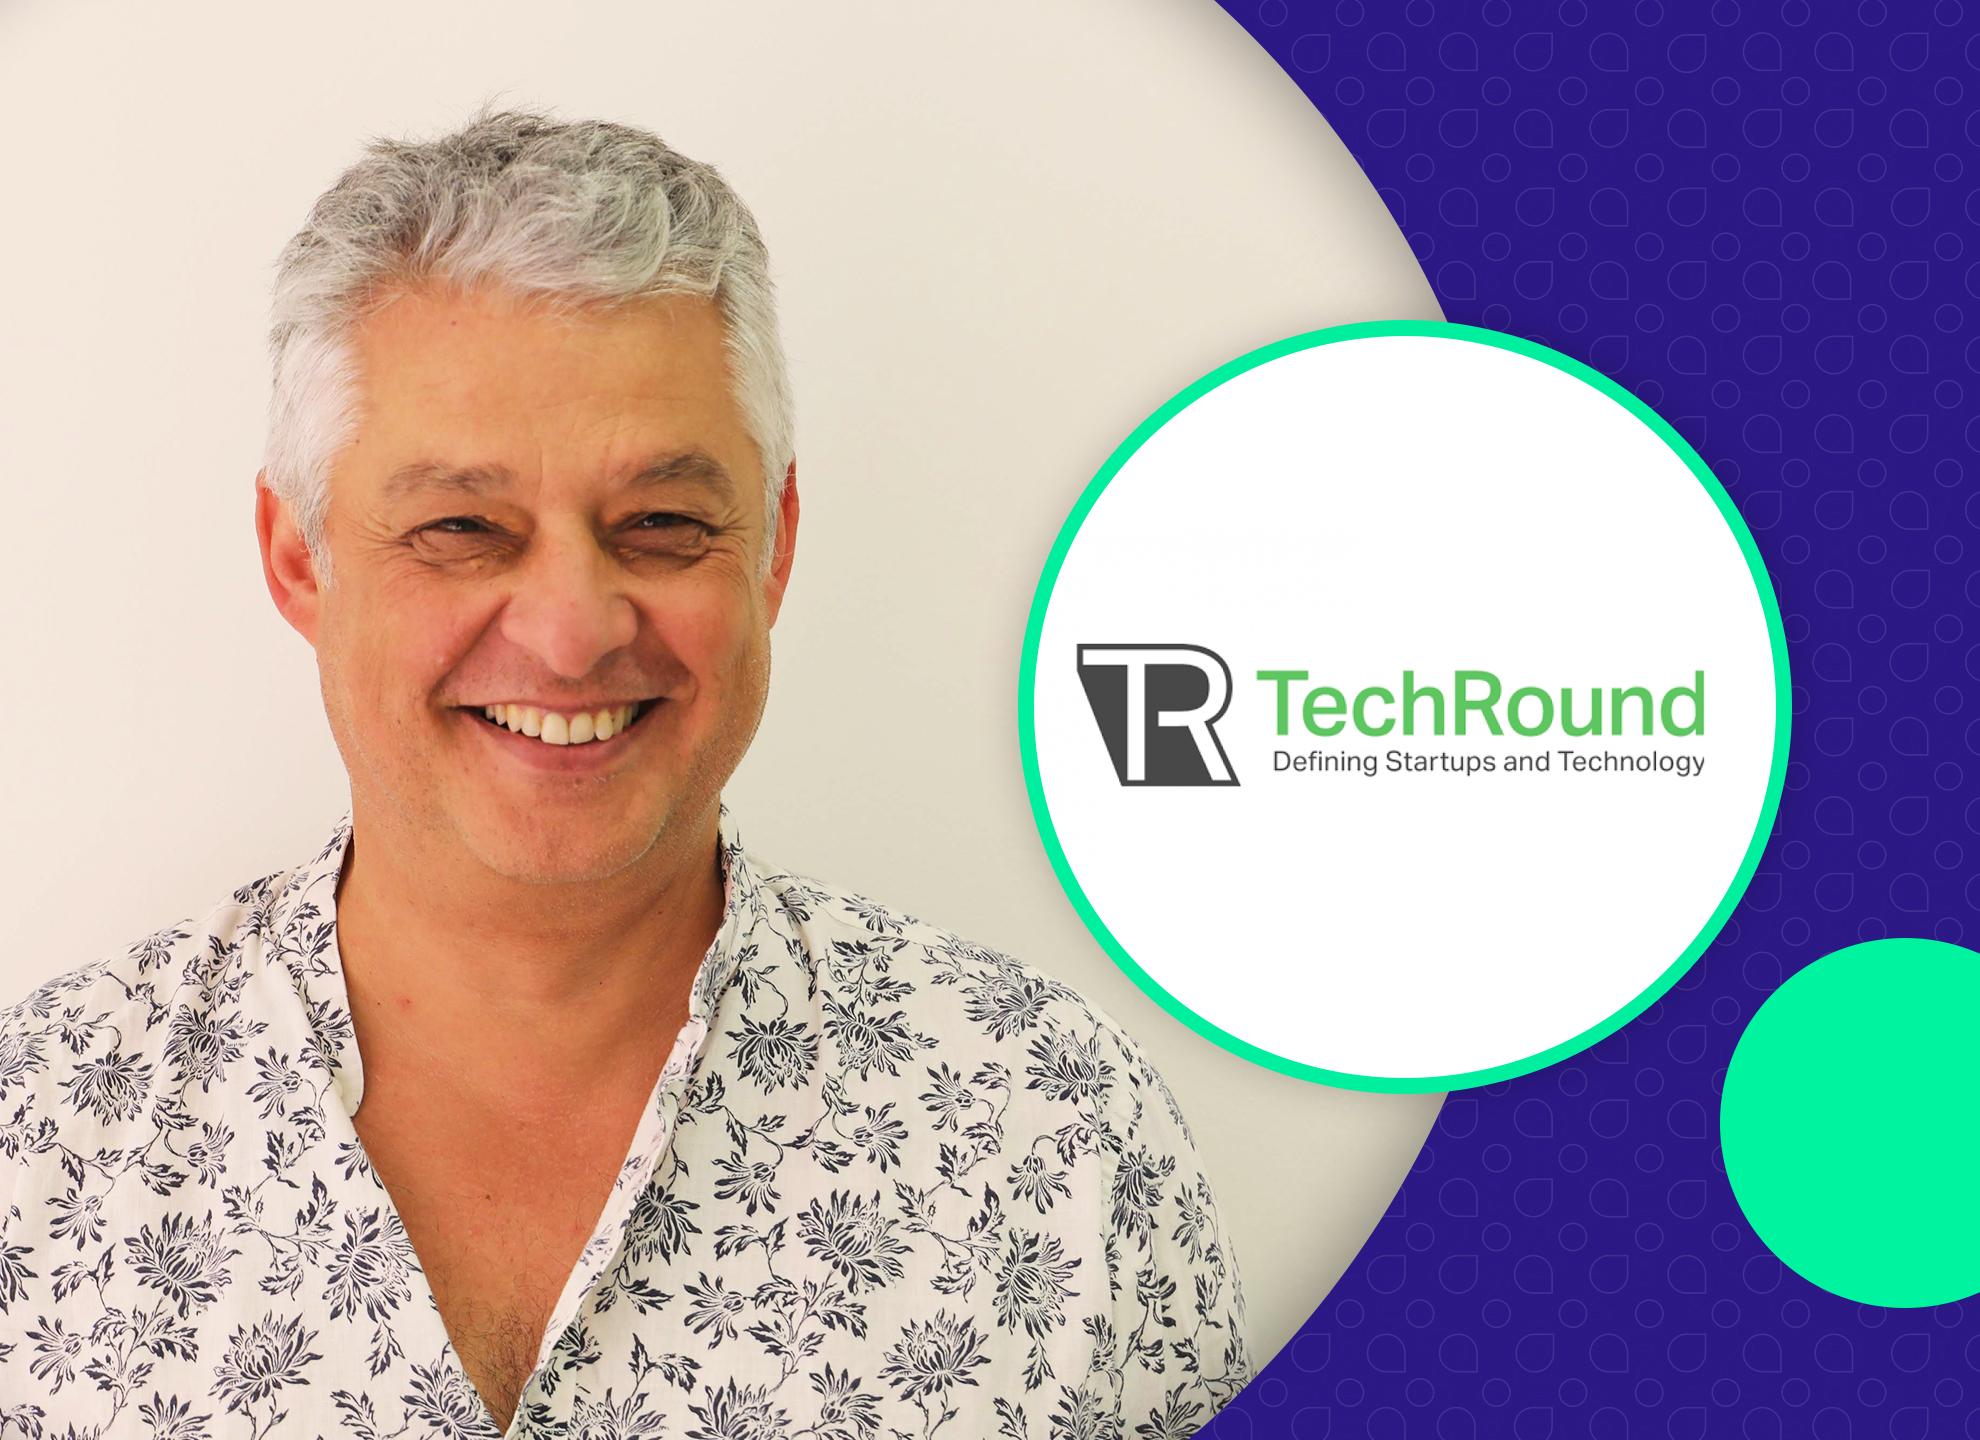 TechRound: Interview with Founder & CEO, Nadim Sadek